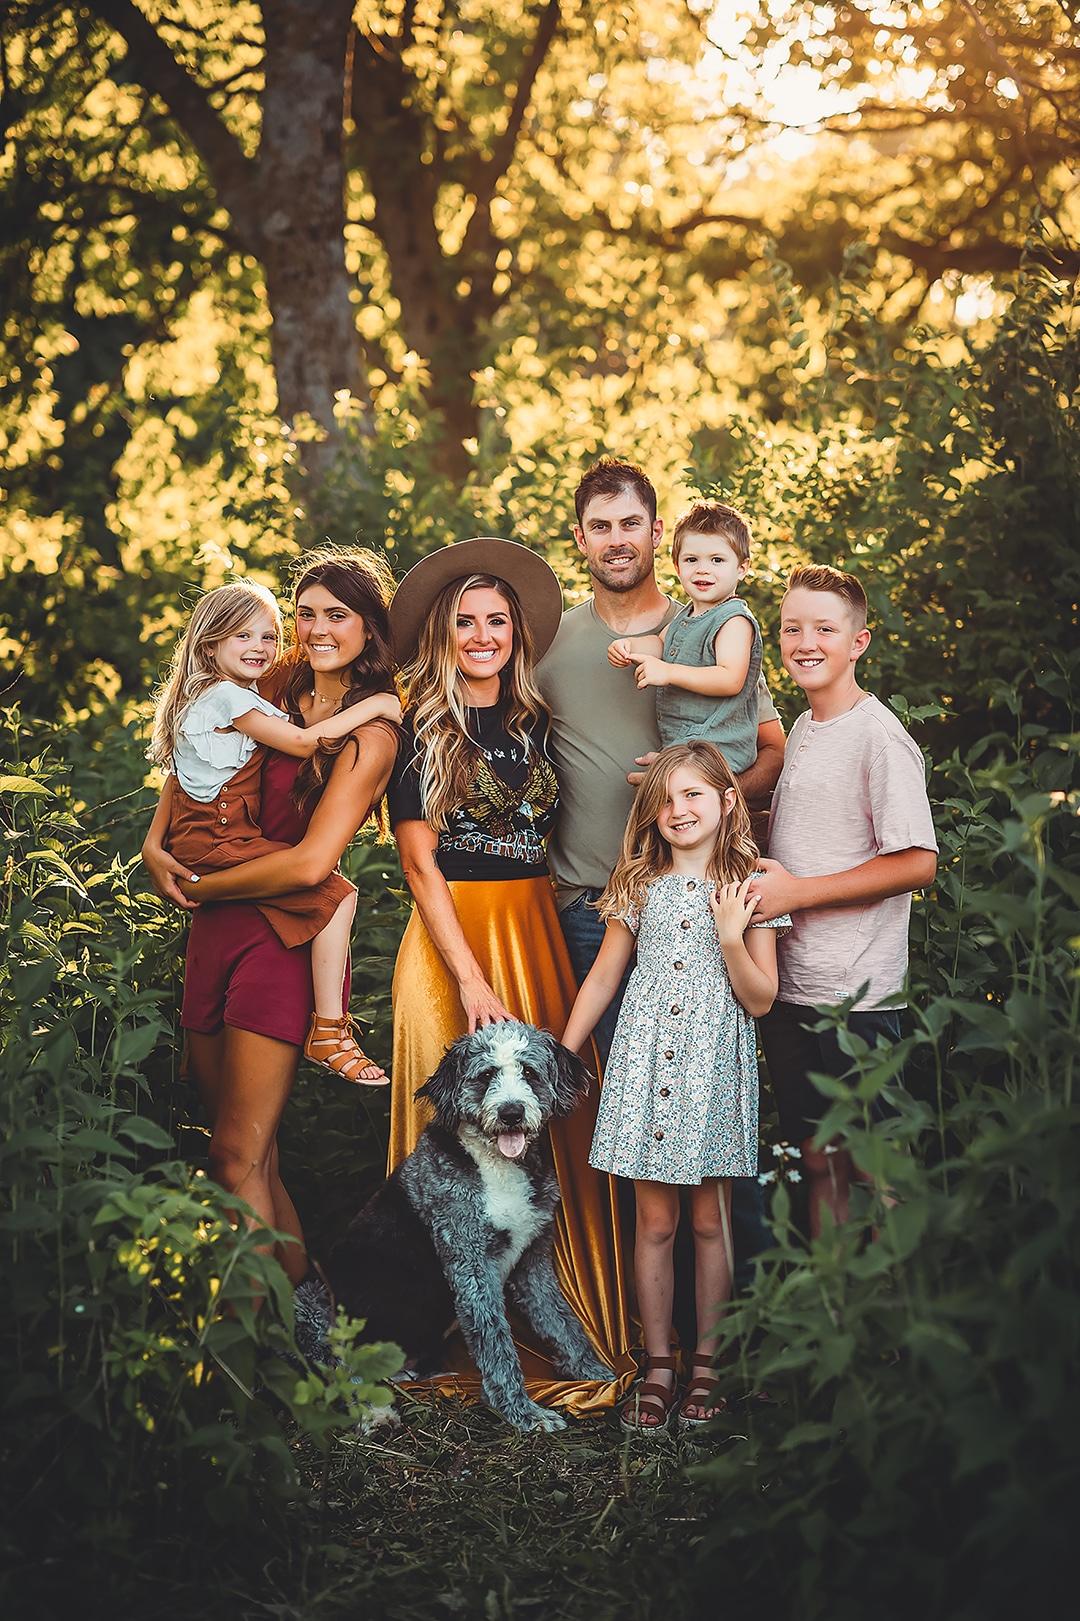 Missie Lafrenz's family portfolio